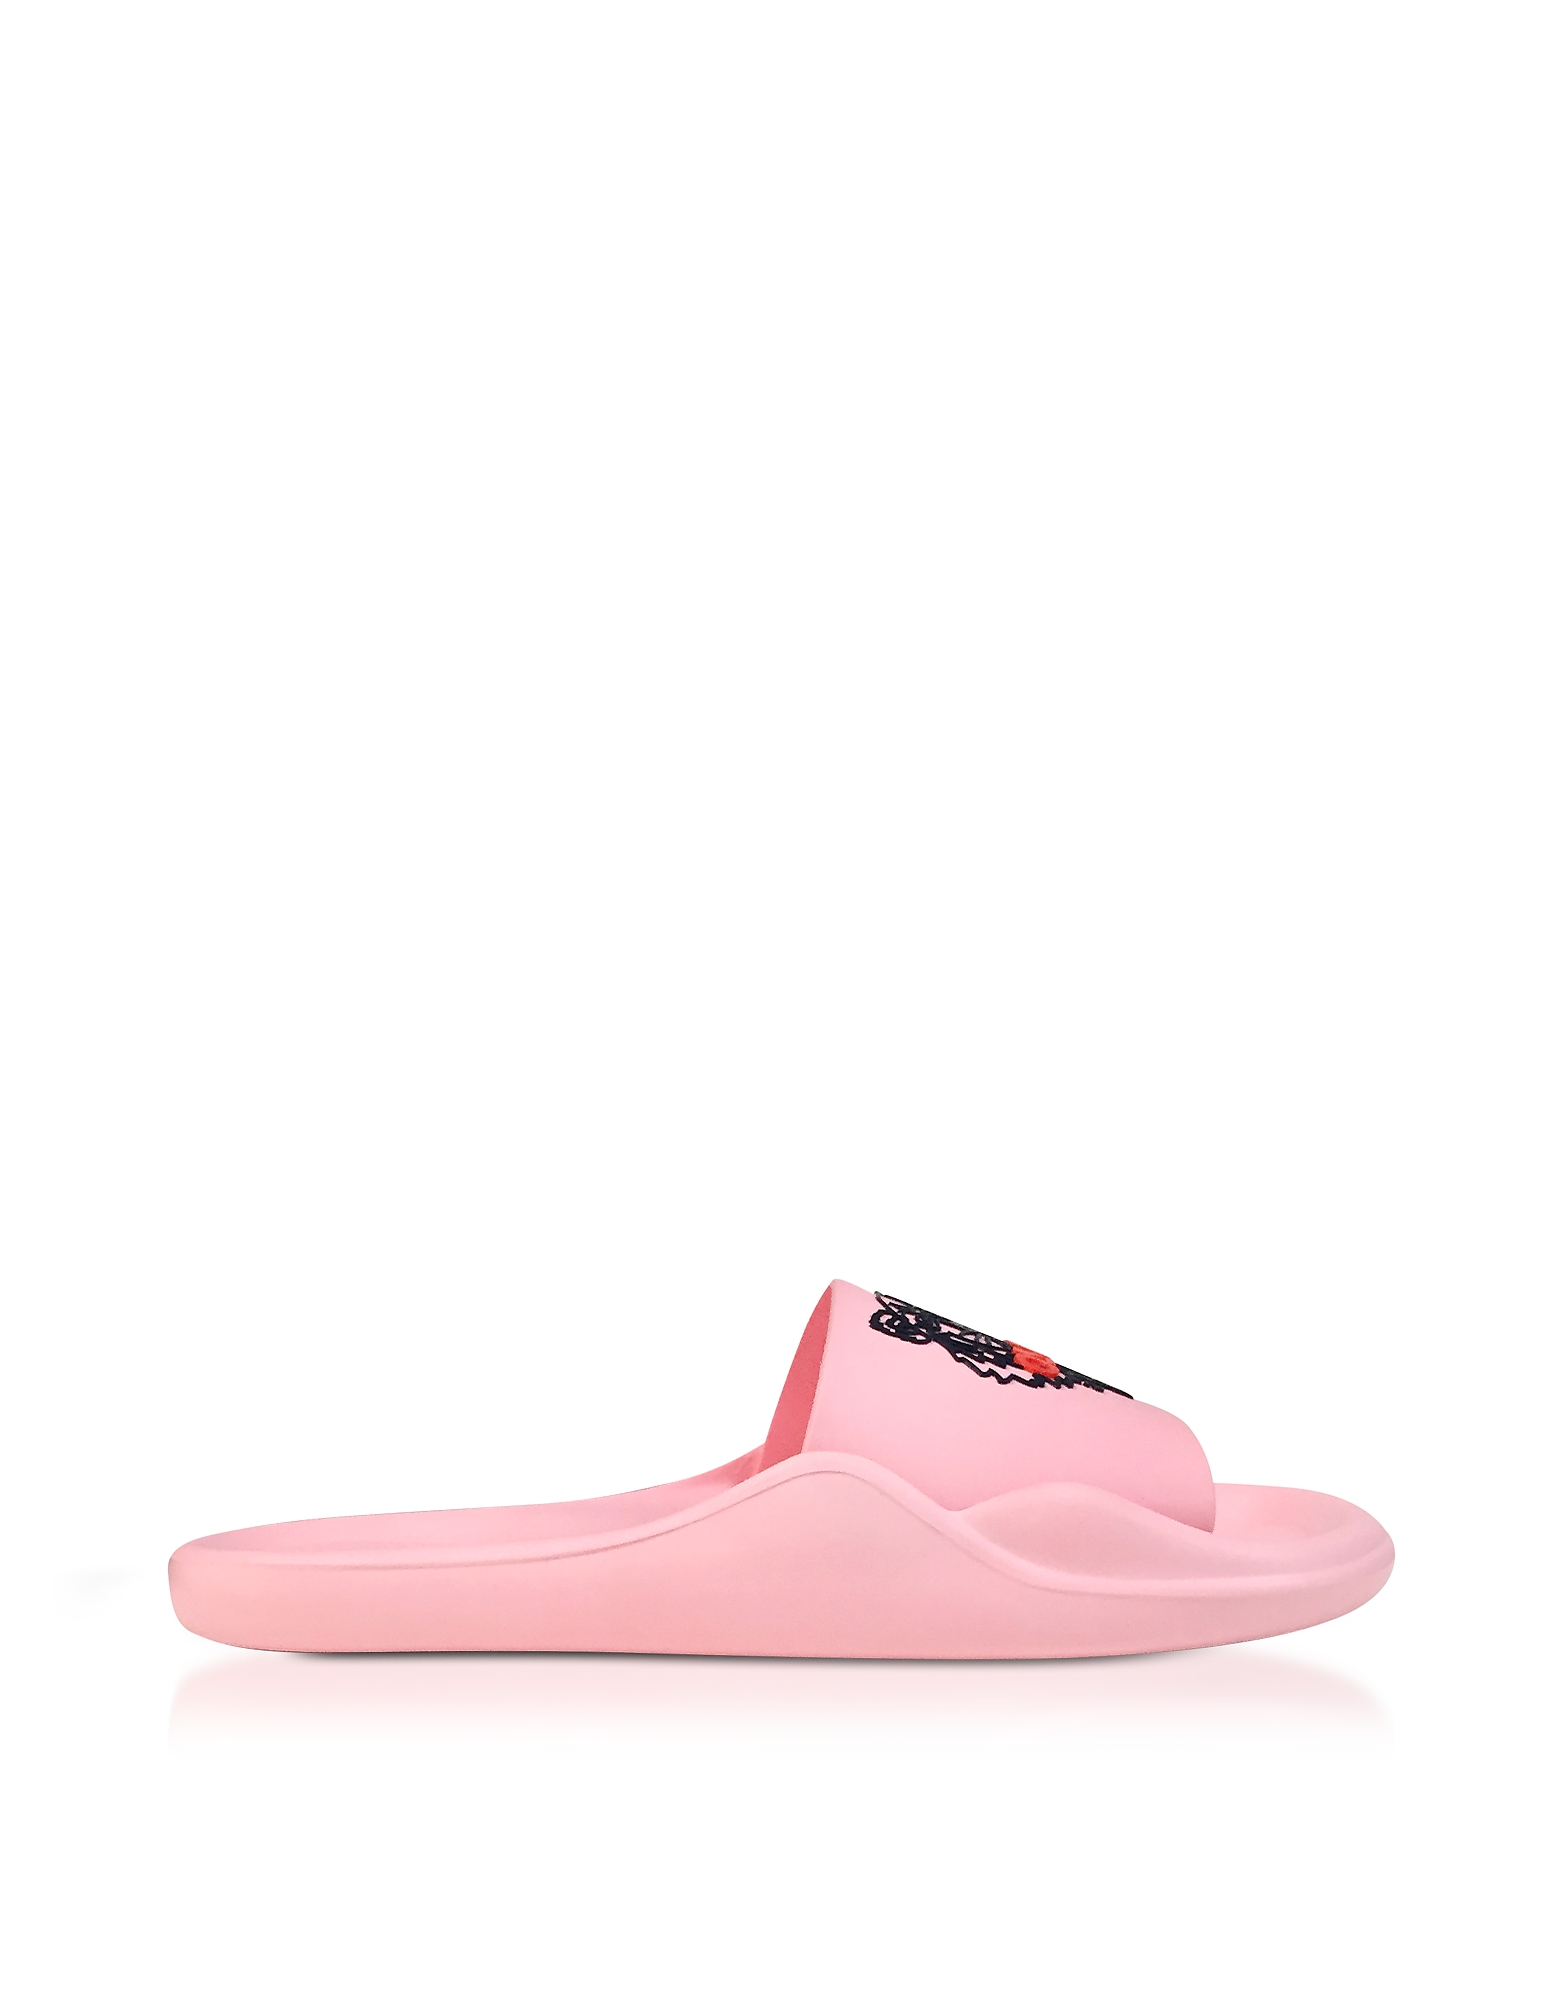 Kenzo Shoes, Flamingo Pink Women's Pool Sandals w/Tiger Logo